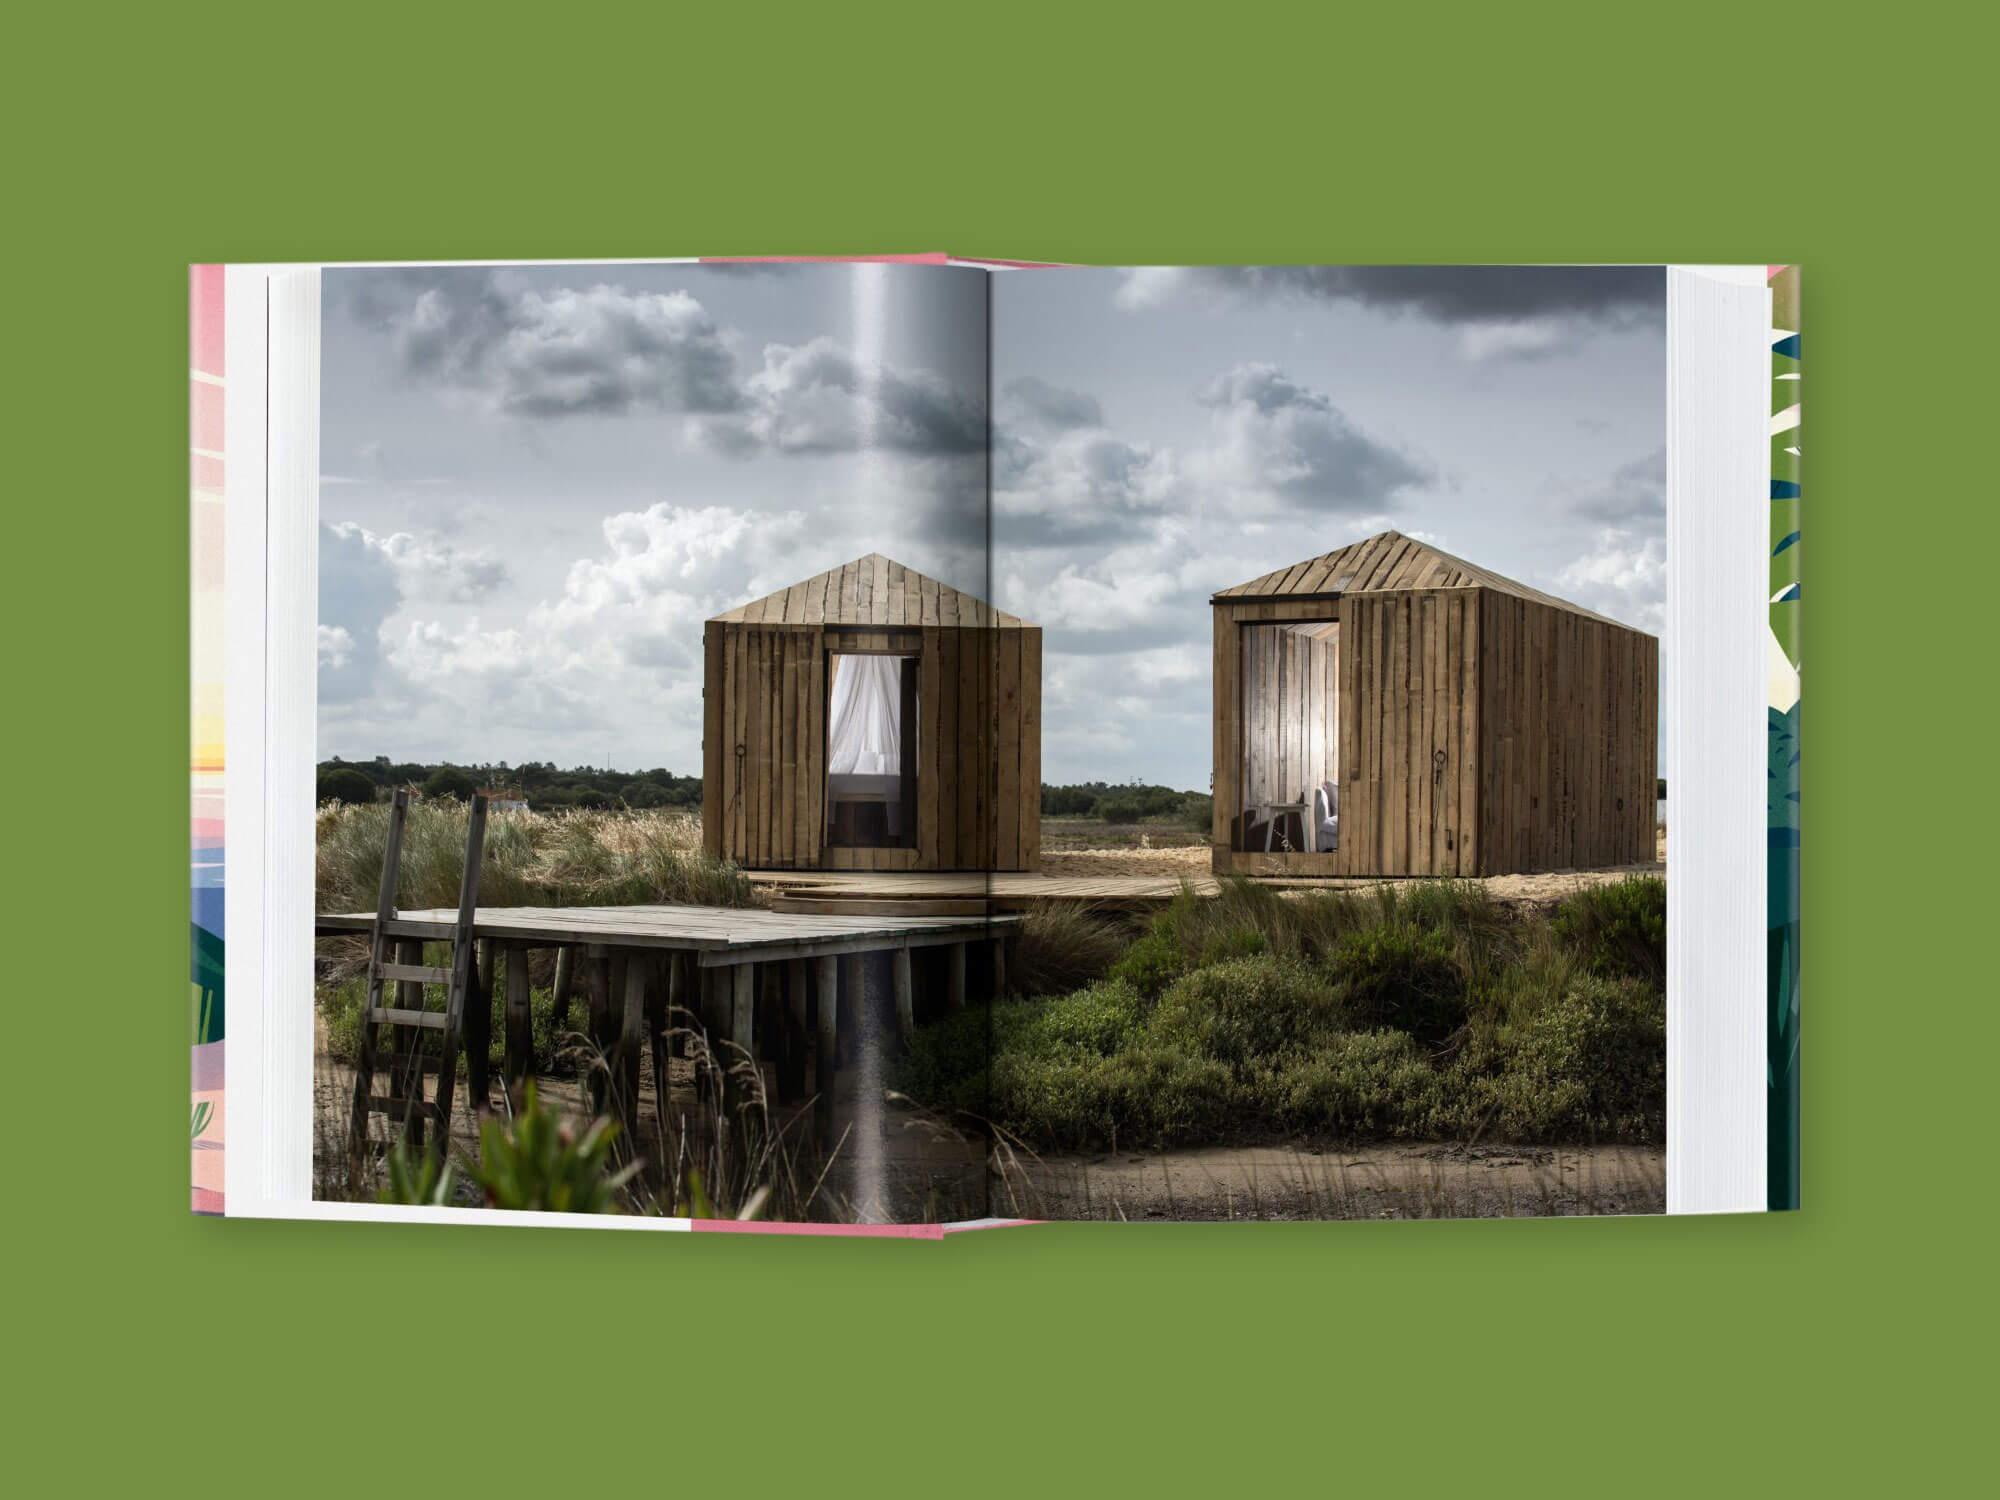 cabins book